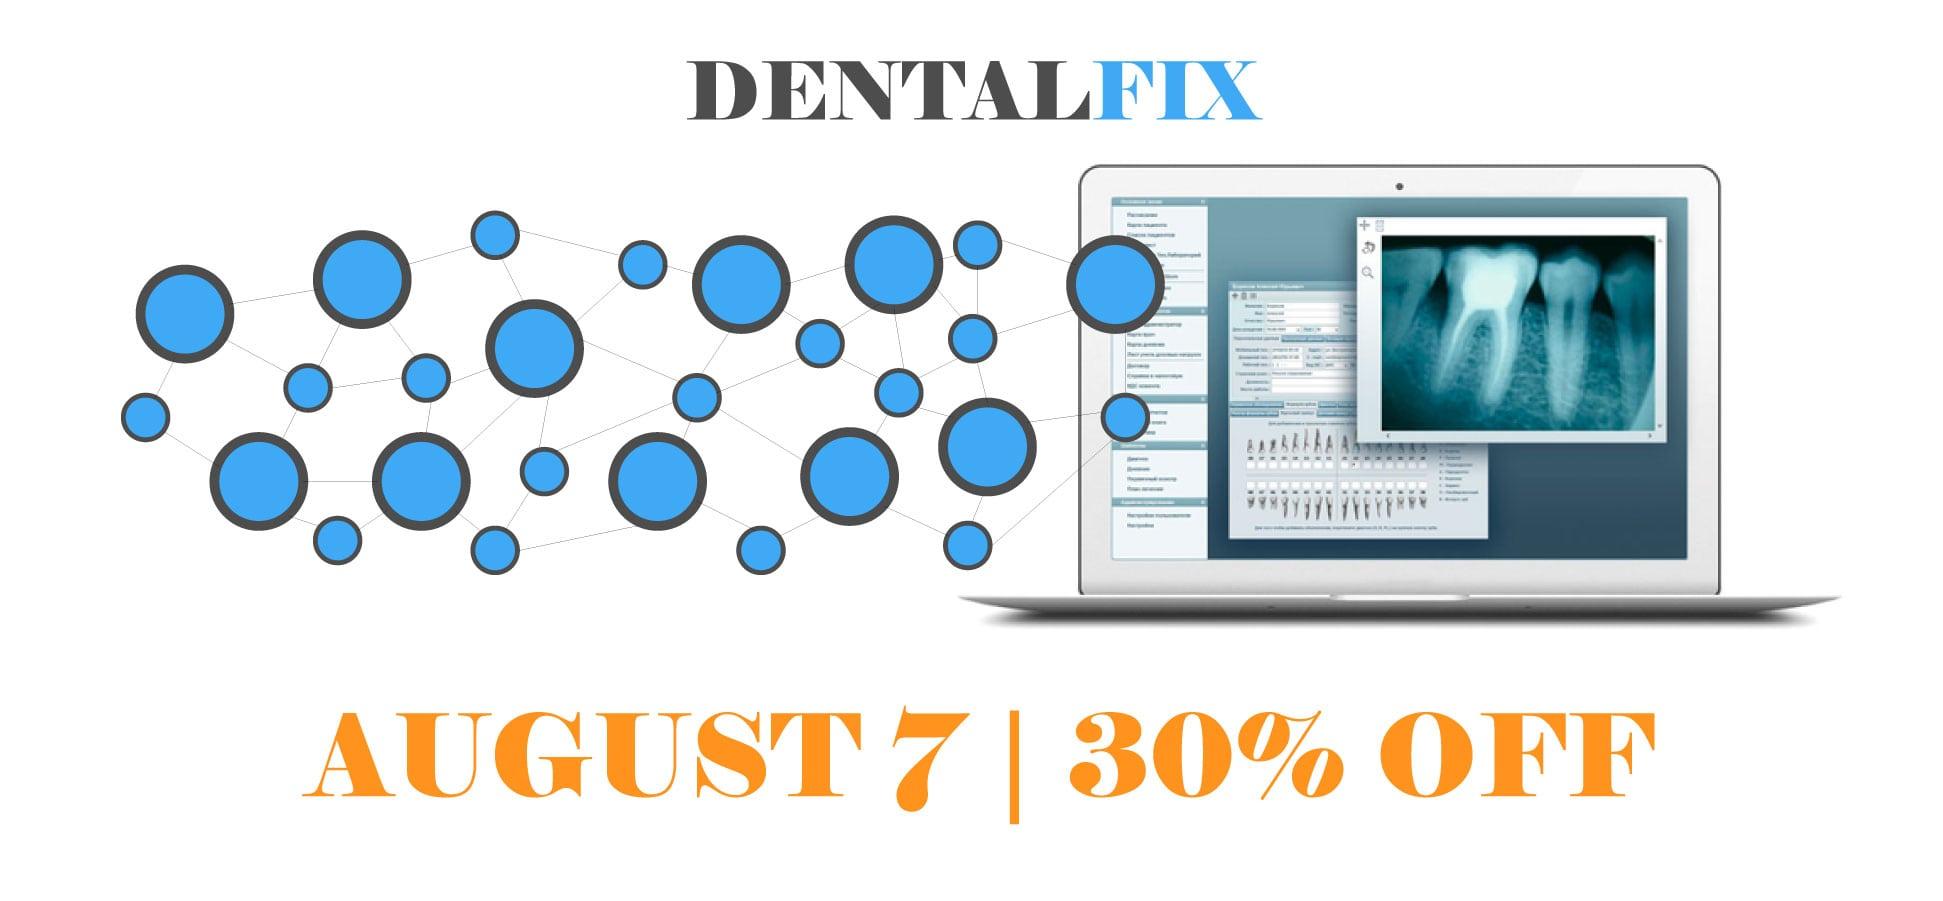 30% off dentalfix ico